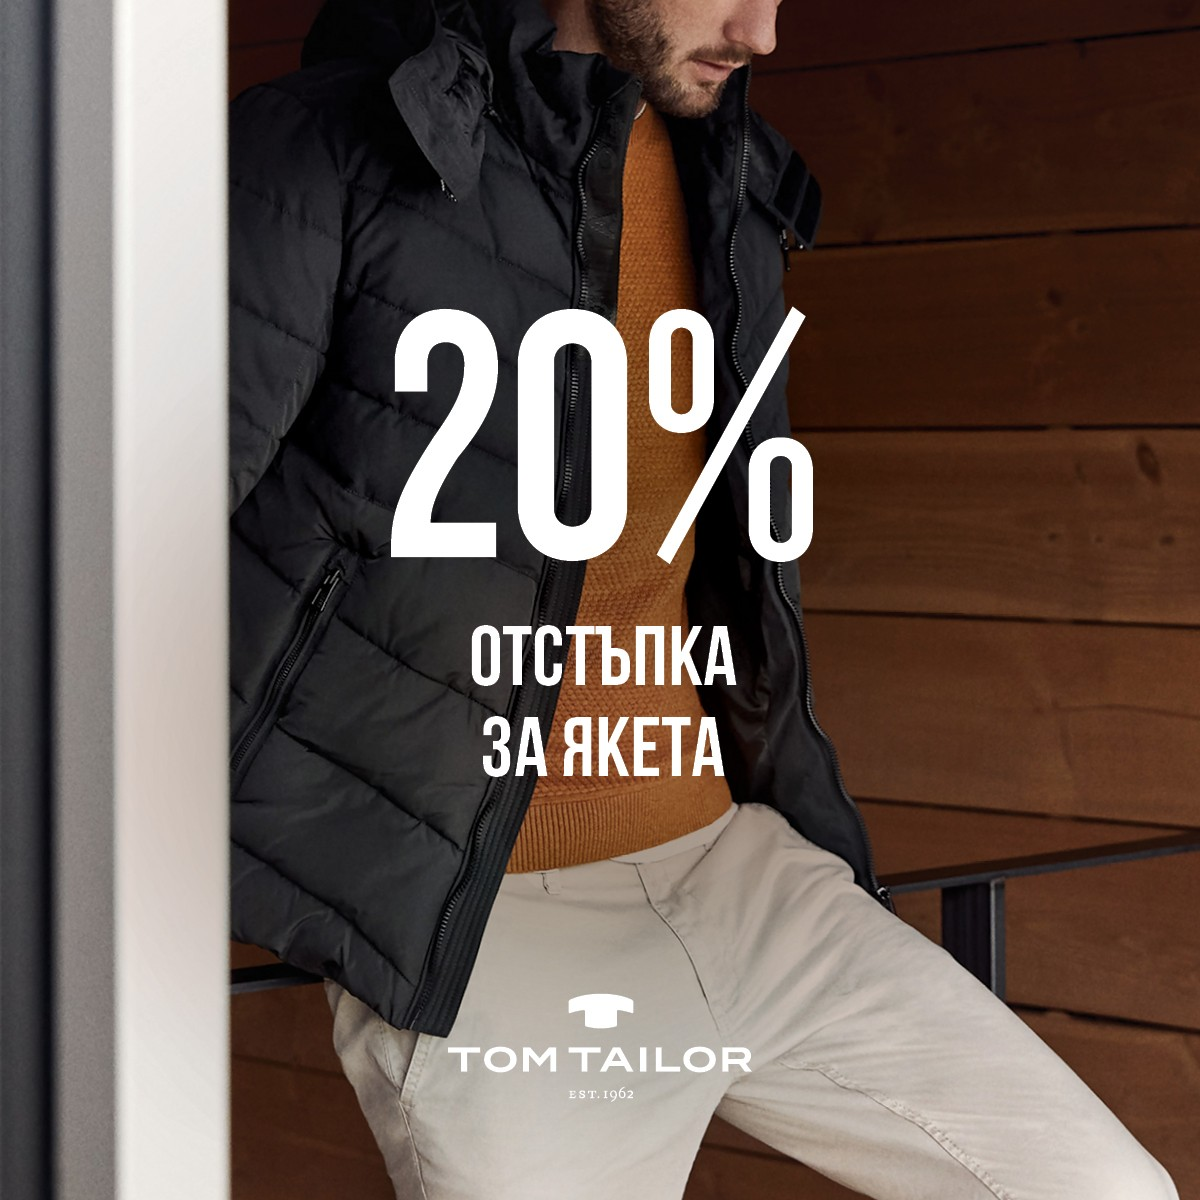 Промоция на якета в магазин Tom Tailor